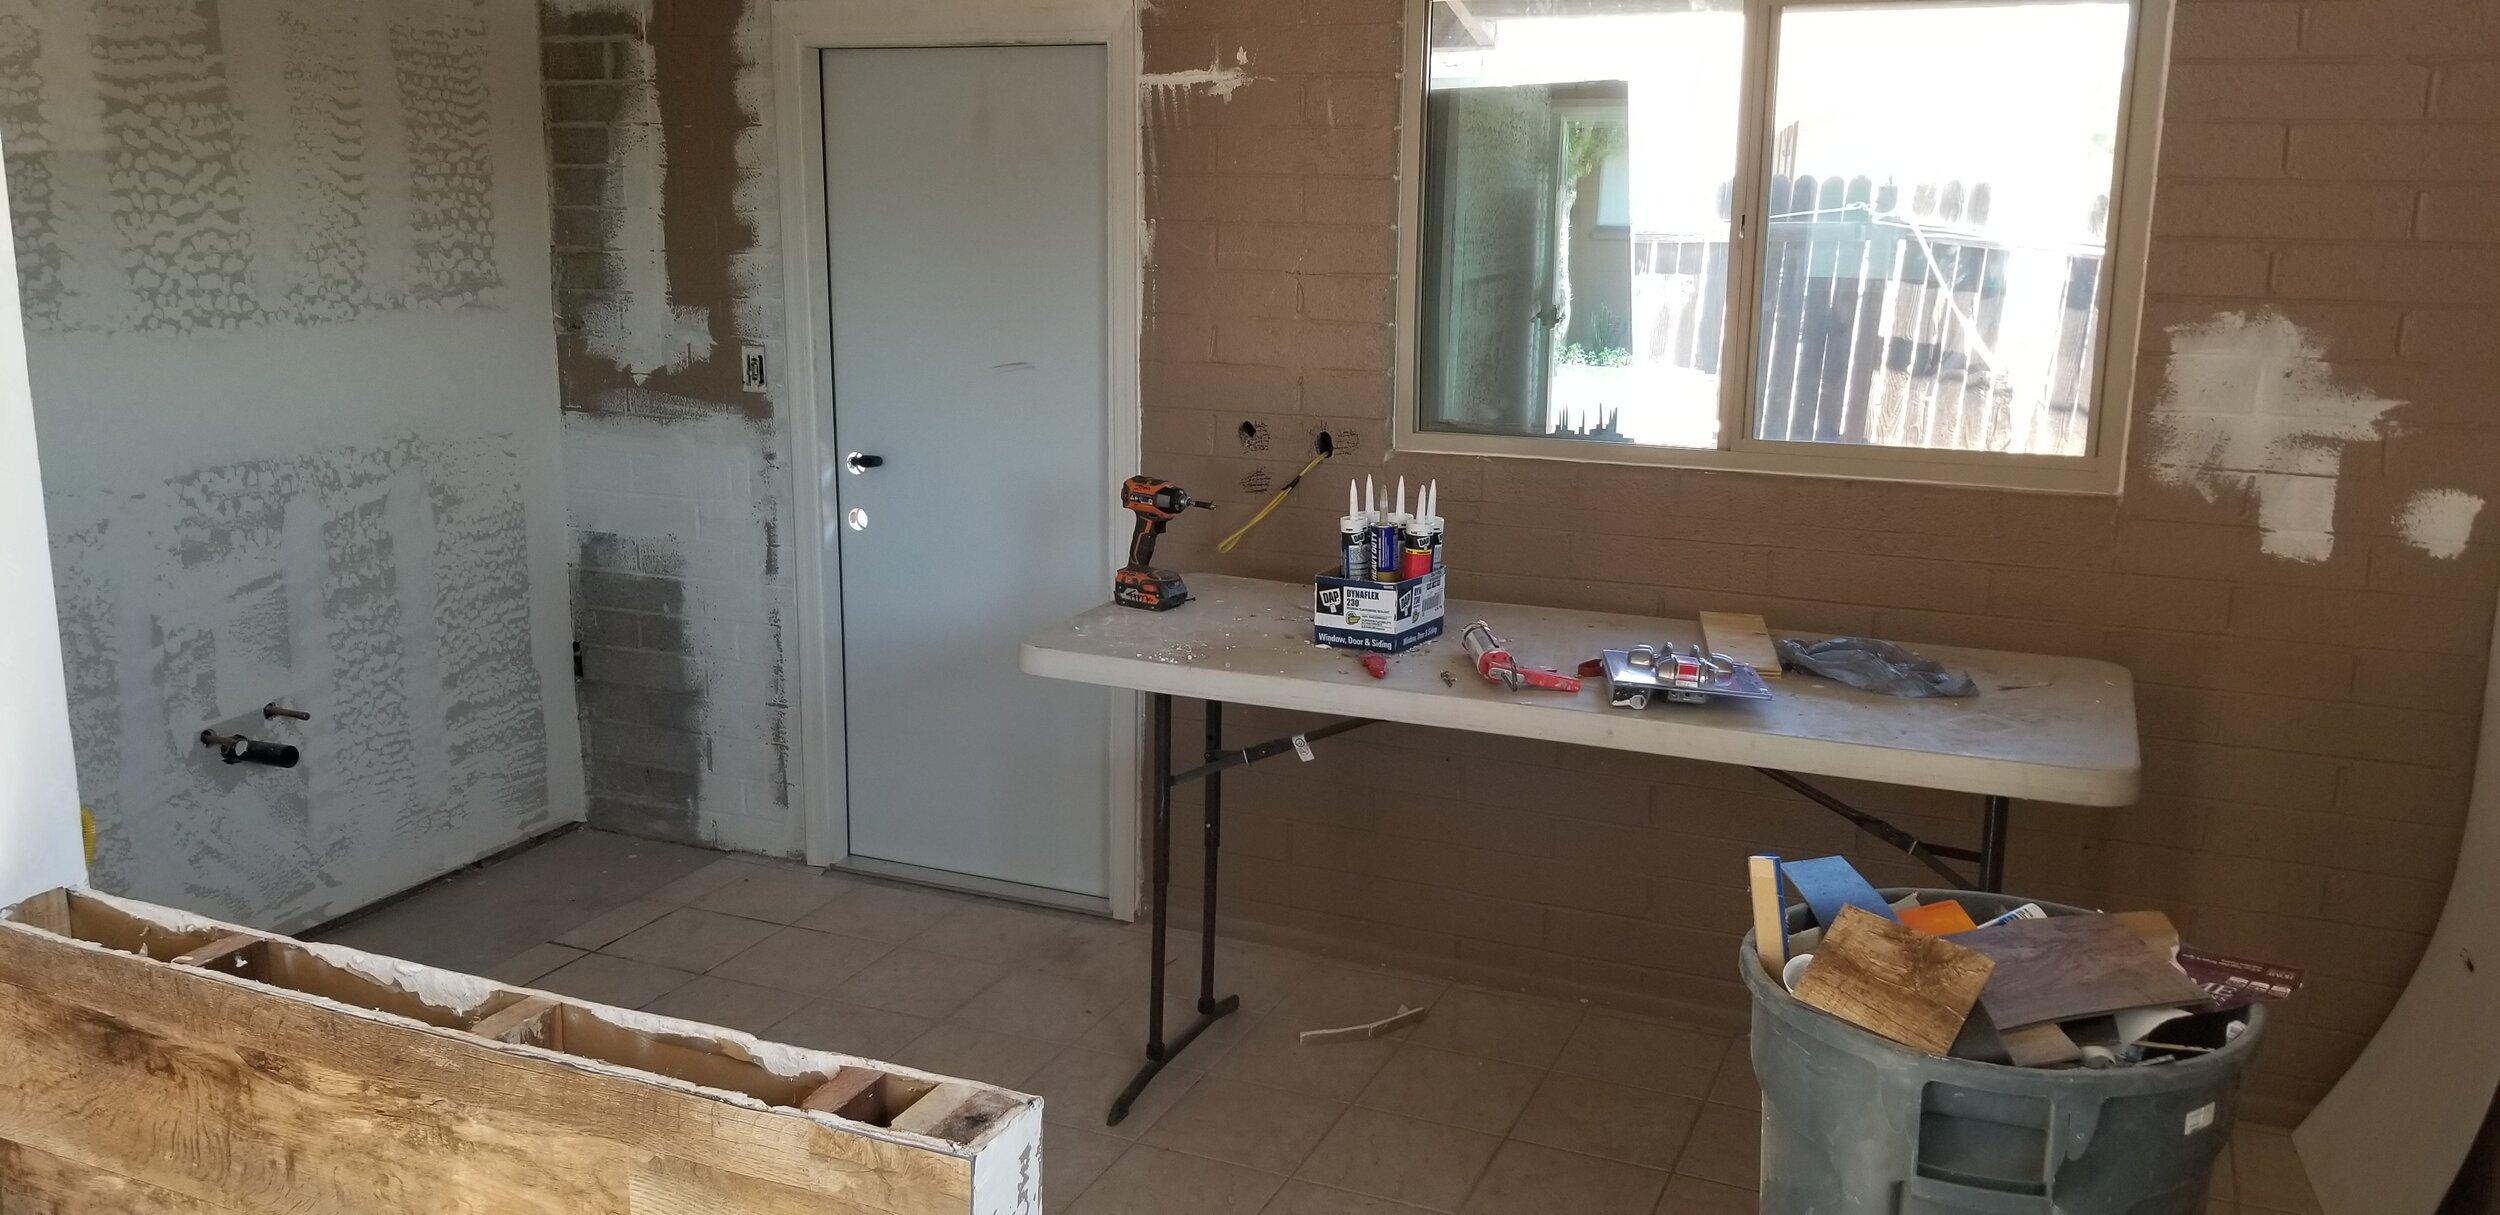 Kitchen sheetrock & texture